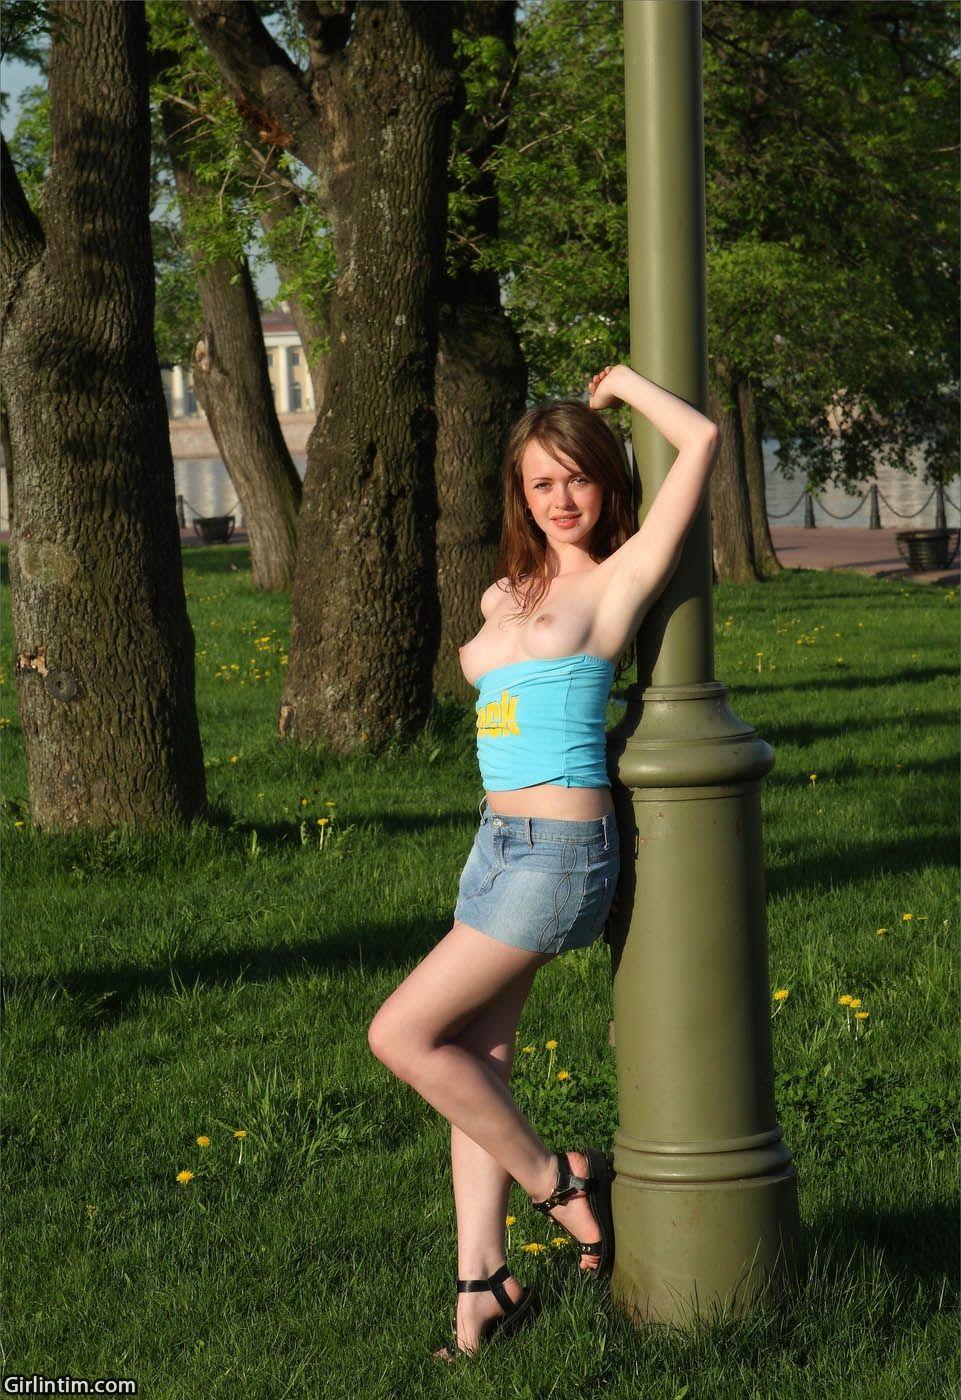 Скрытая камера поднять юбку